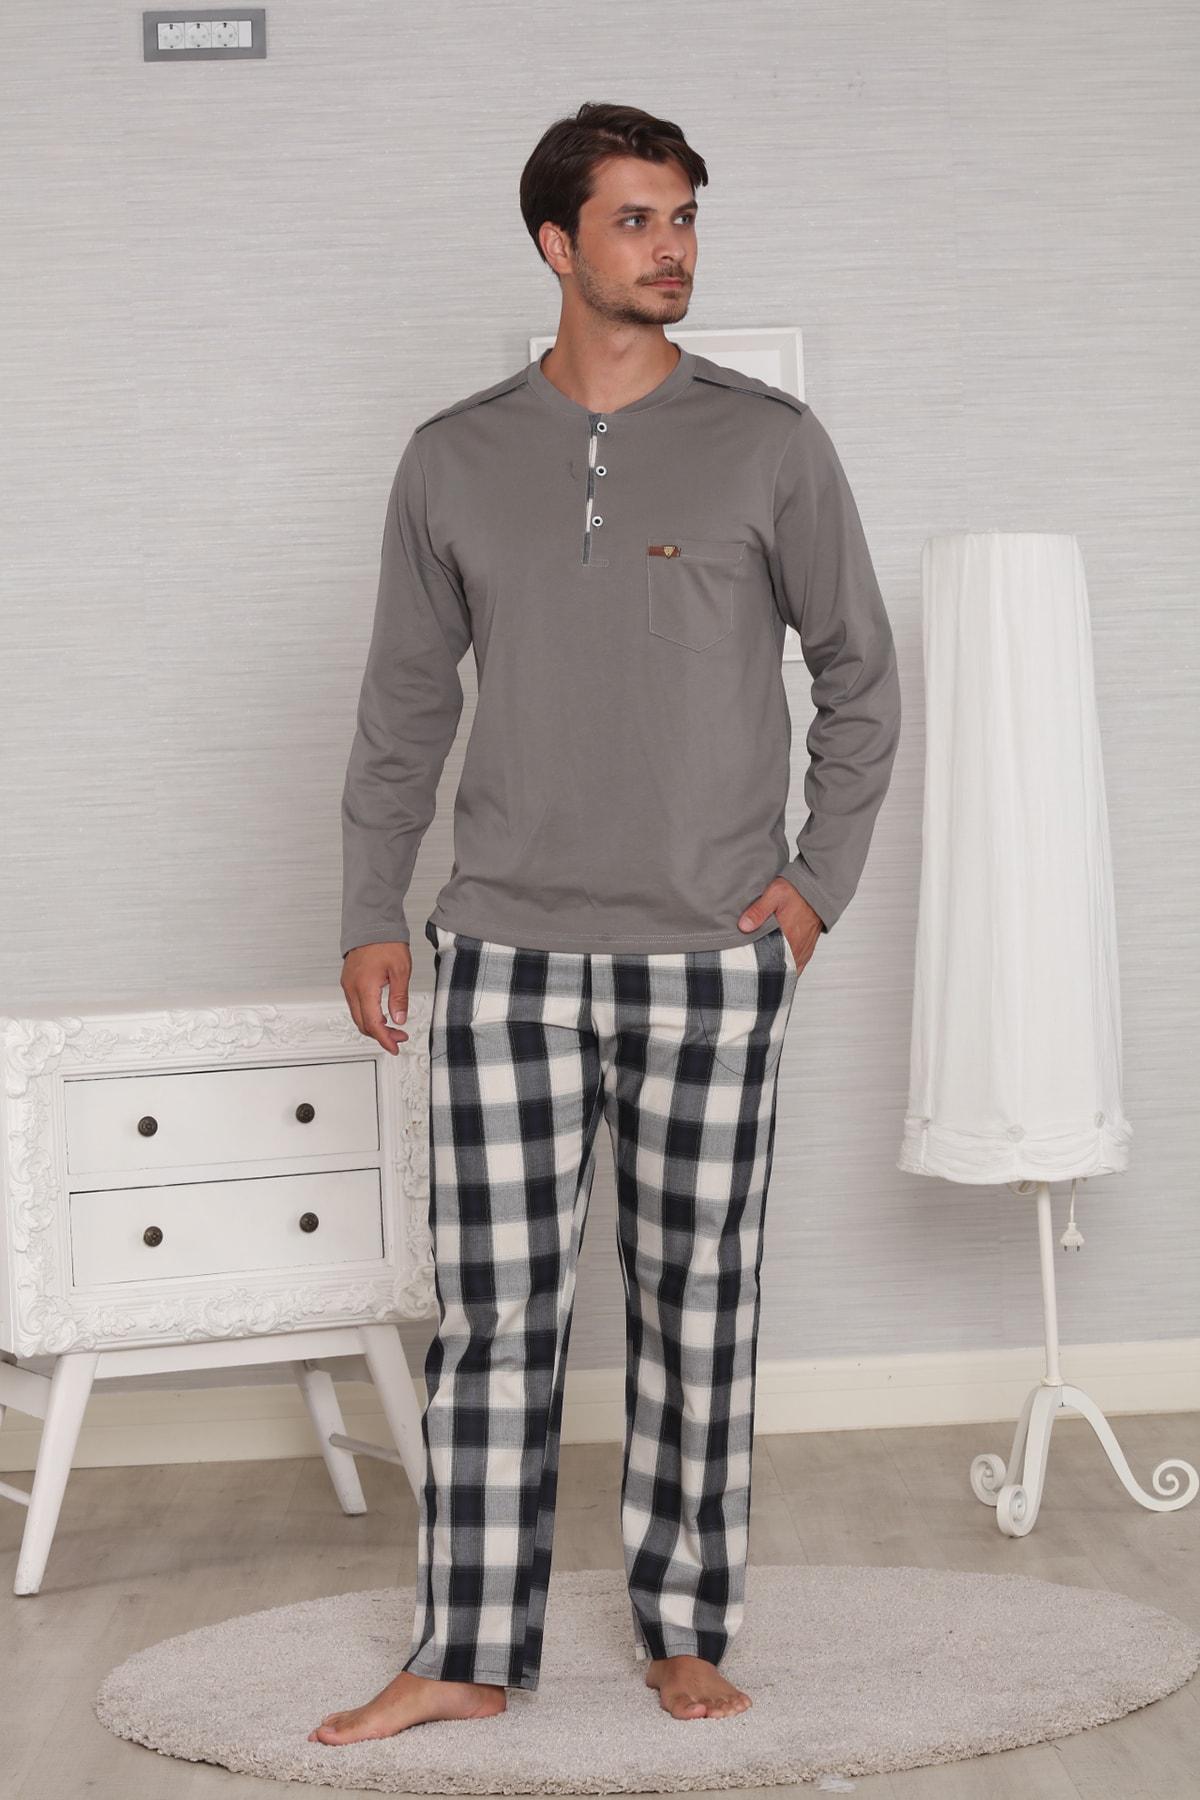 Pelin  Gri Pamuk Penye Ekoseli Pazen Poplin Dokuma 4 Mevsim Penye Erkek Pijama Takımı 2